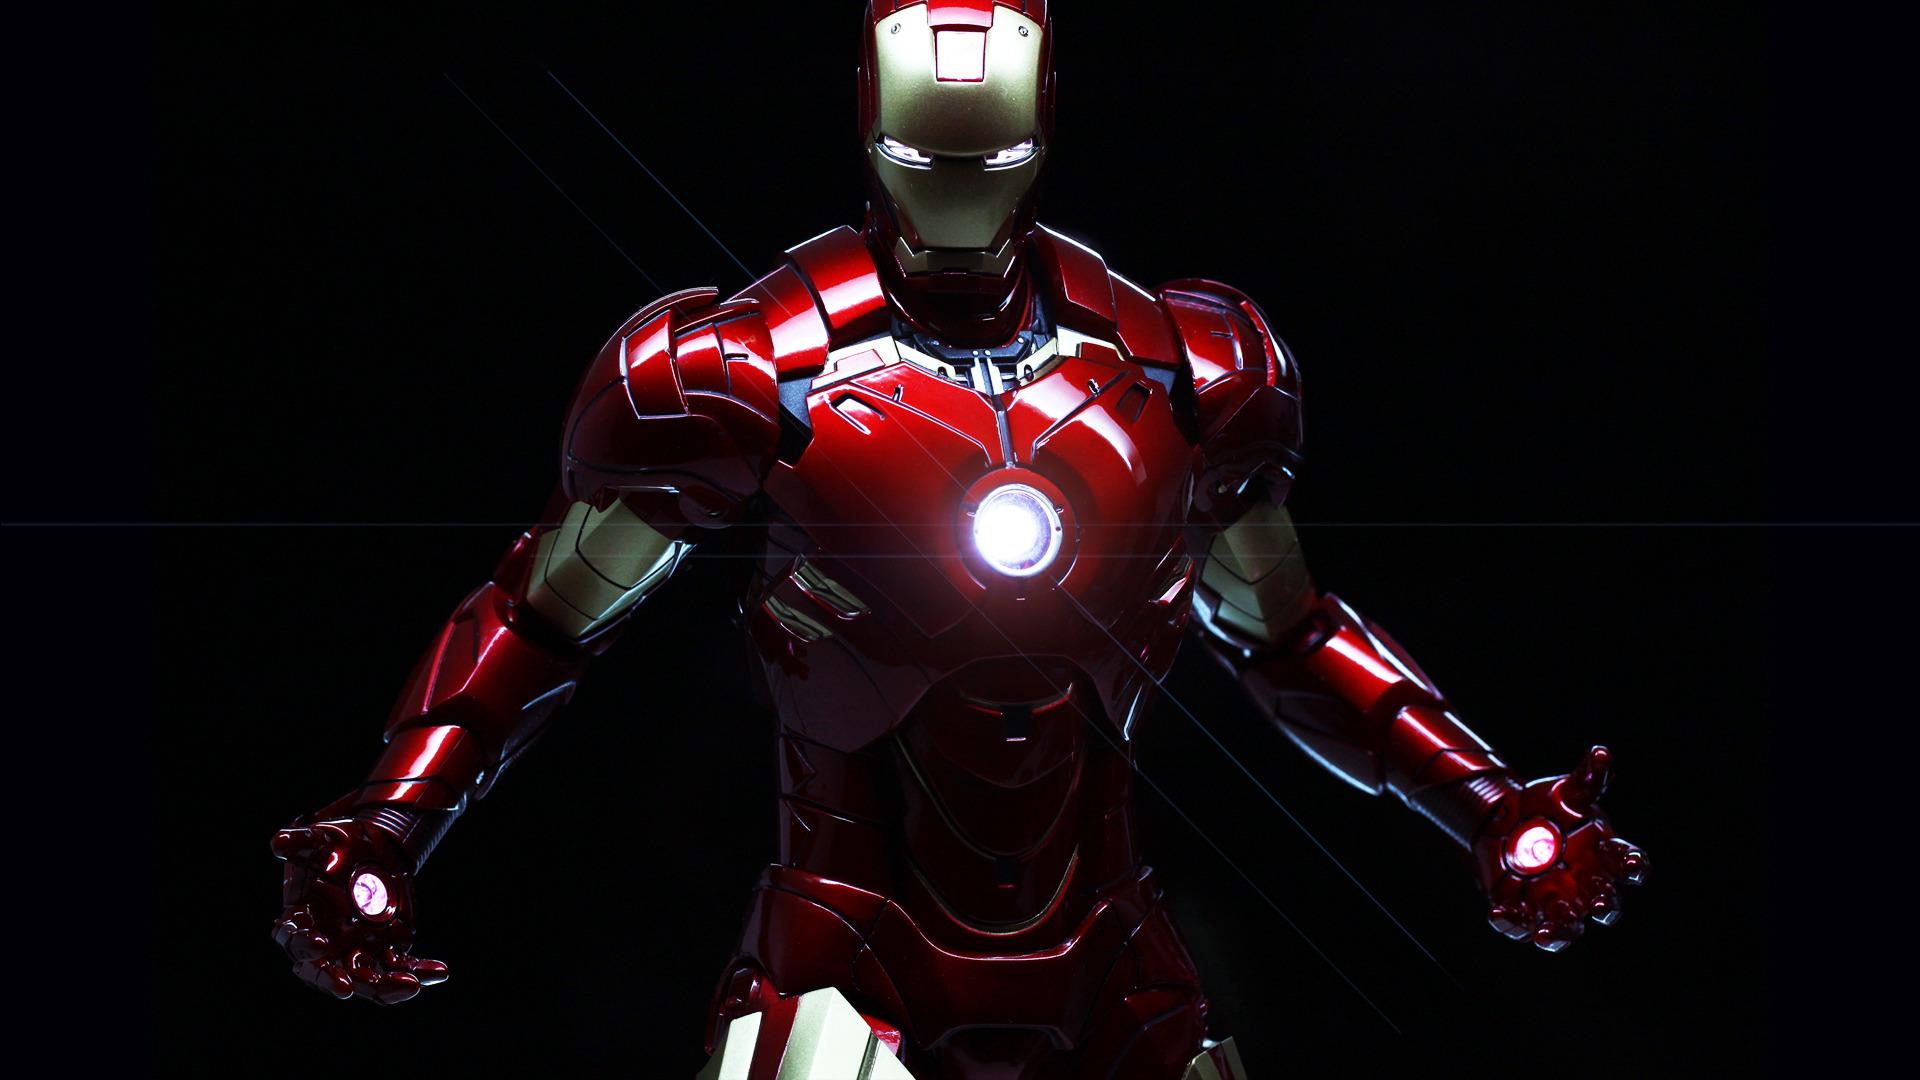 Iron Man 2 Black Background Movies Wallpaper: Iron Man 2 Wallpaper 10